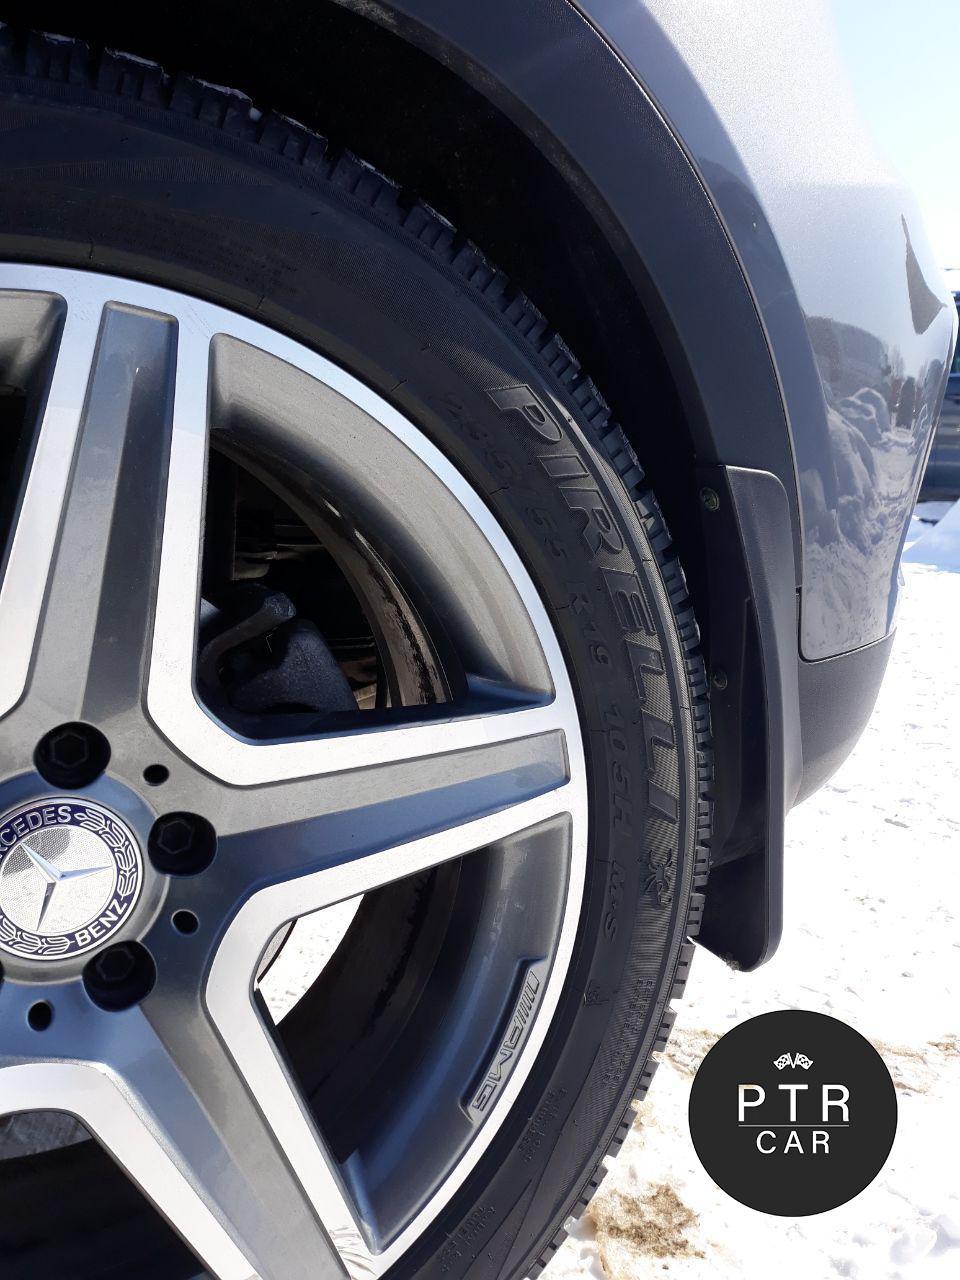 Брызговики Lexus GS 350 2011- (полный кт 4-шт)